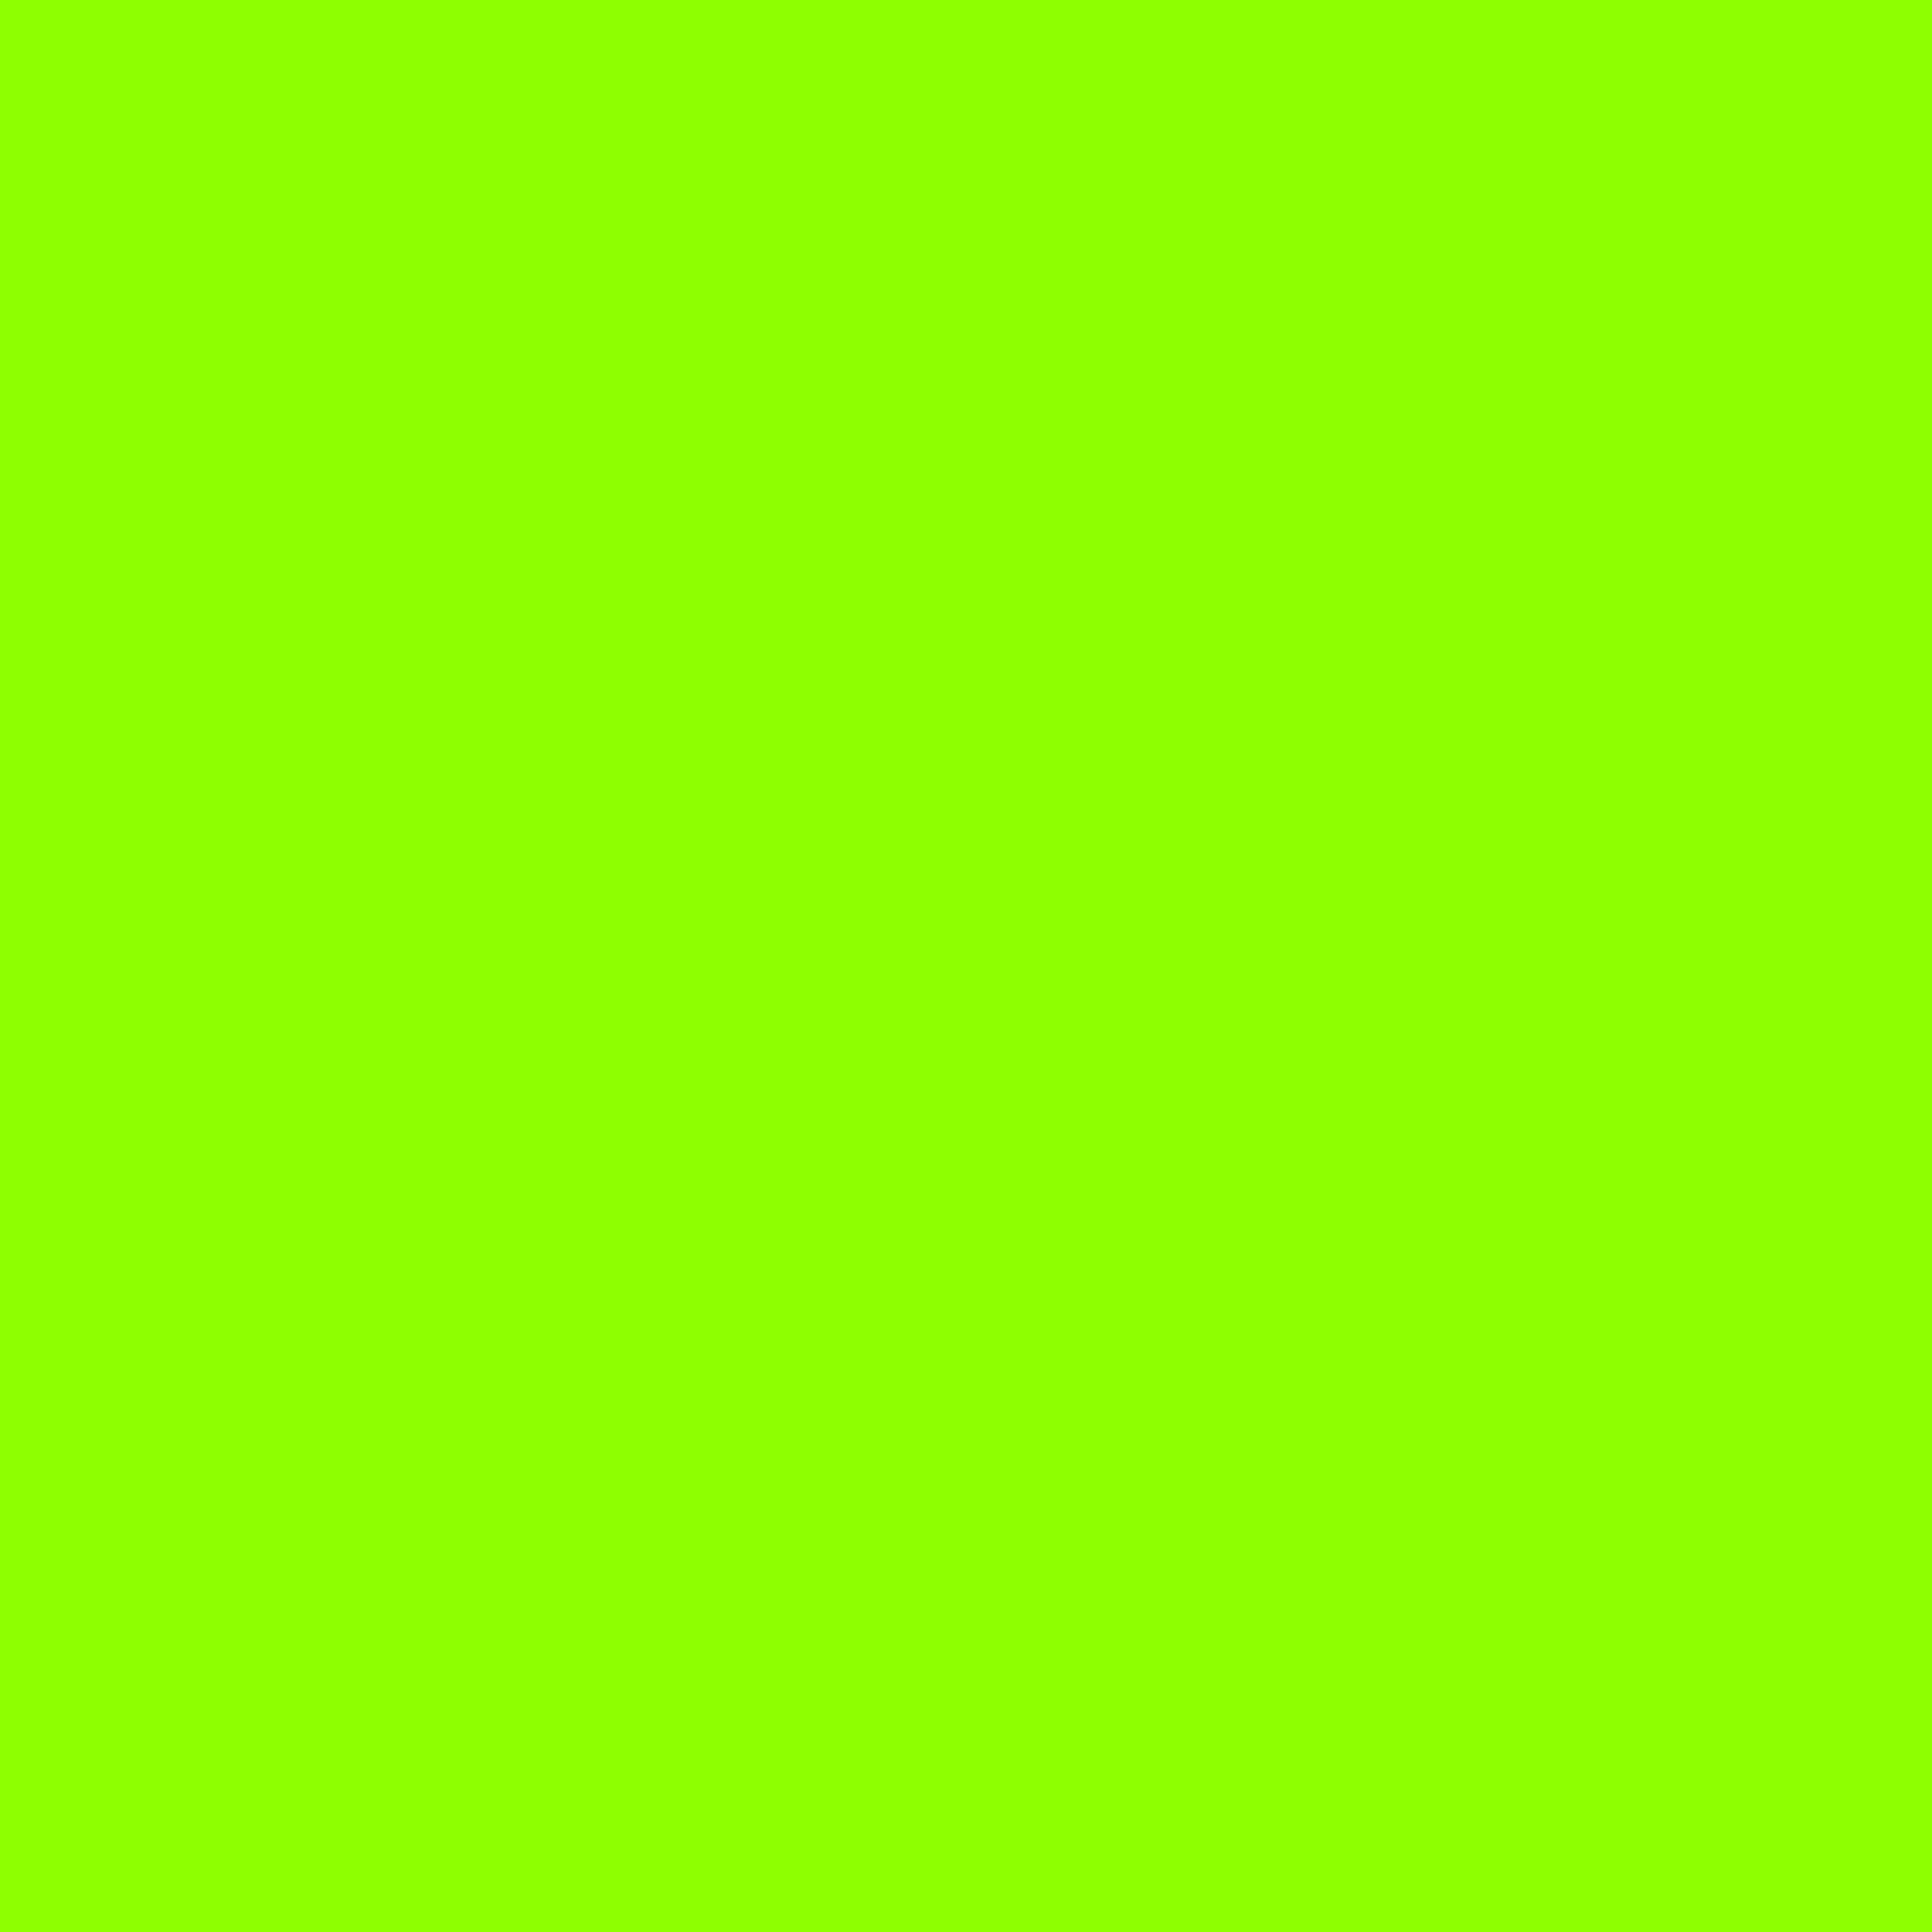 K37.0.8 Lime Green